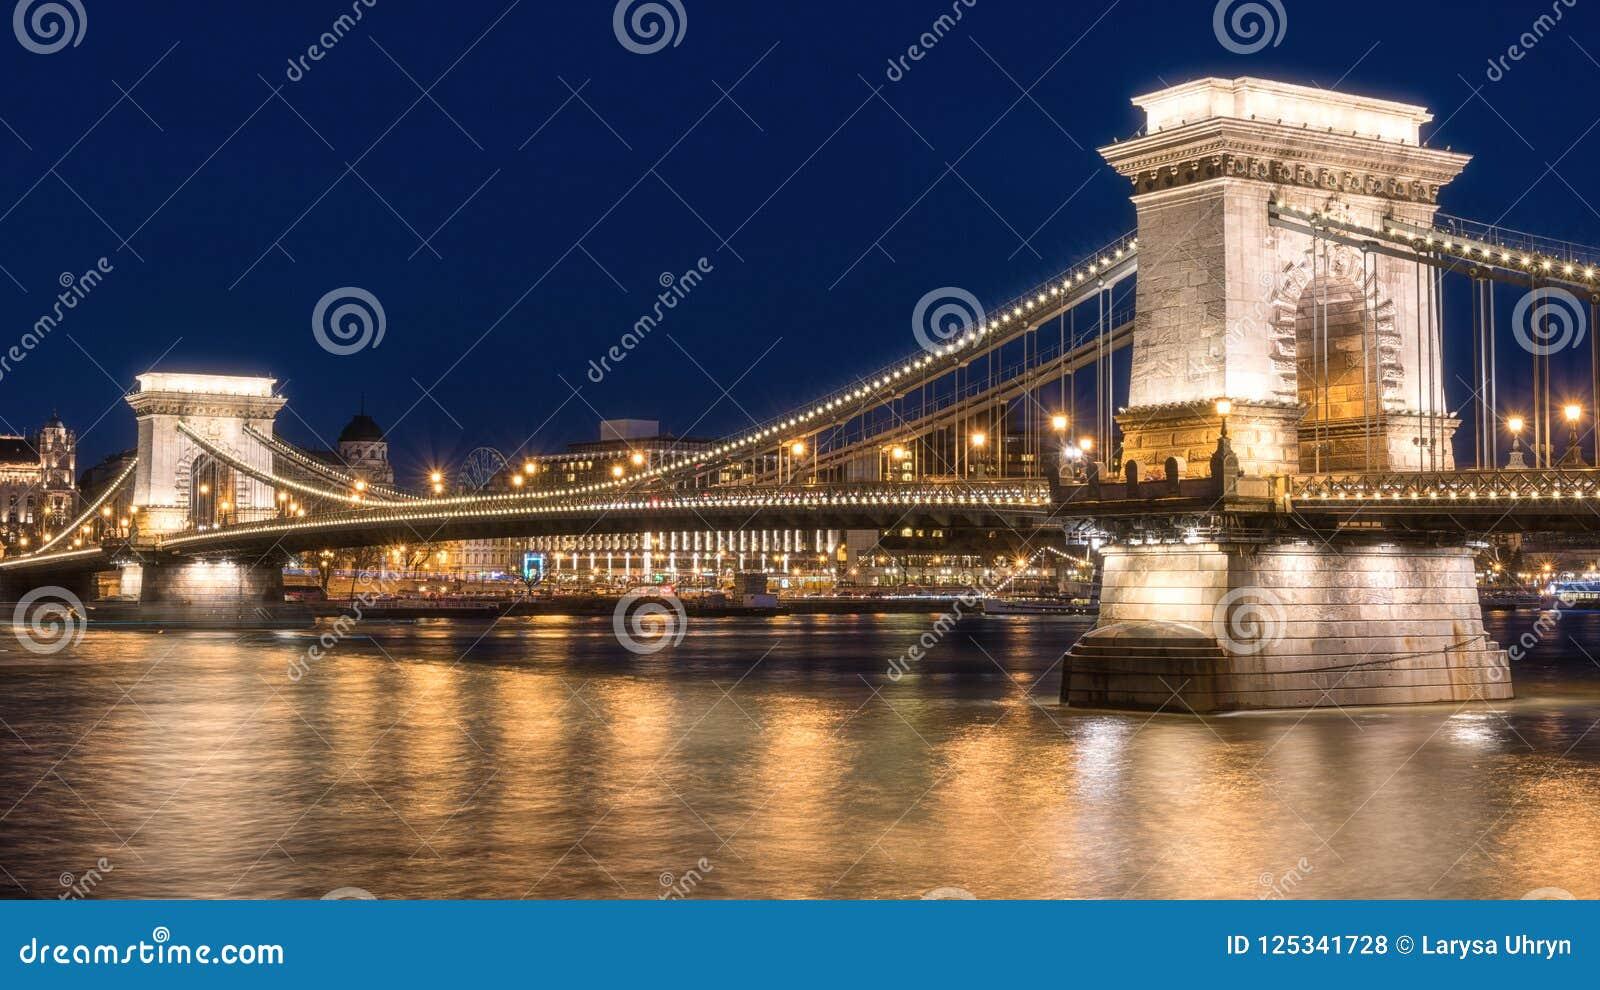 Budapest, lanchid alle ore blu crepuscolari, Ungheria, Europa di Szechenyi del ponte a catena